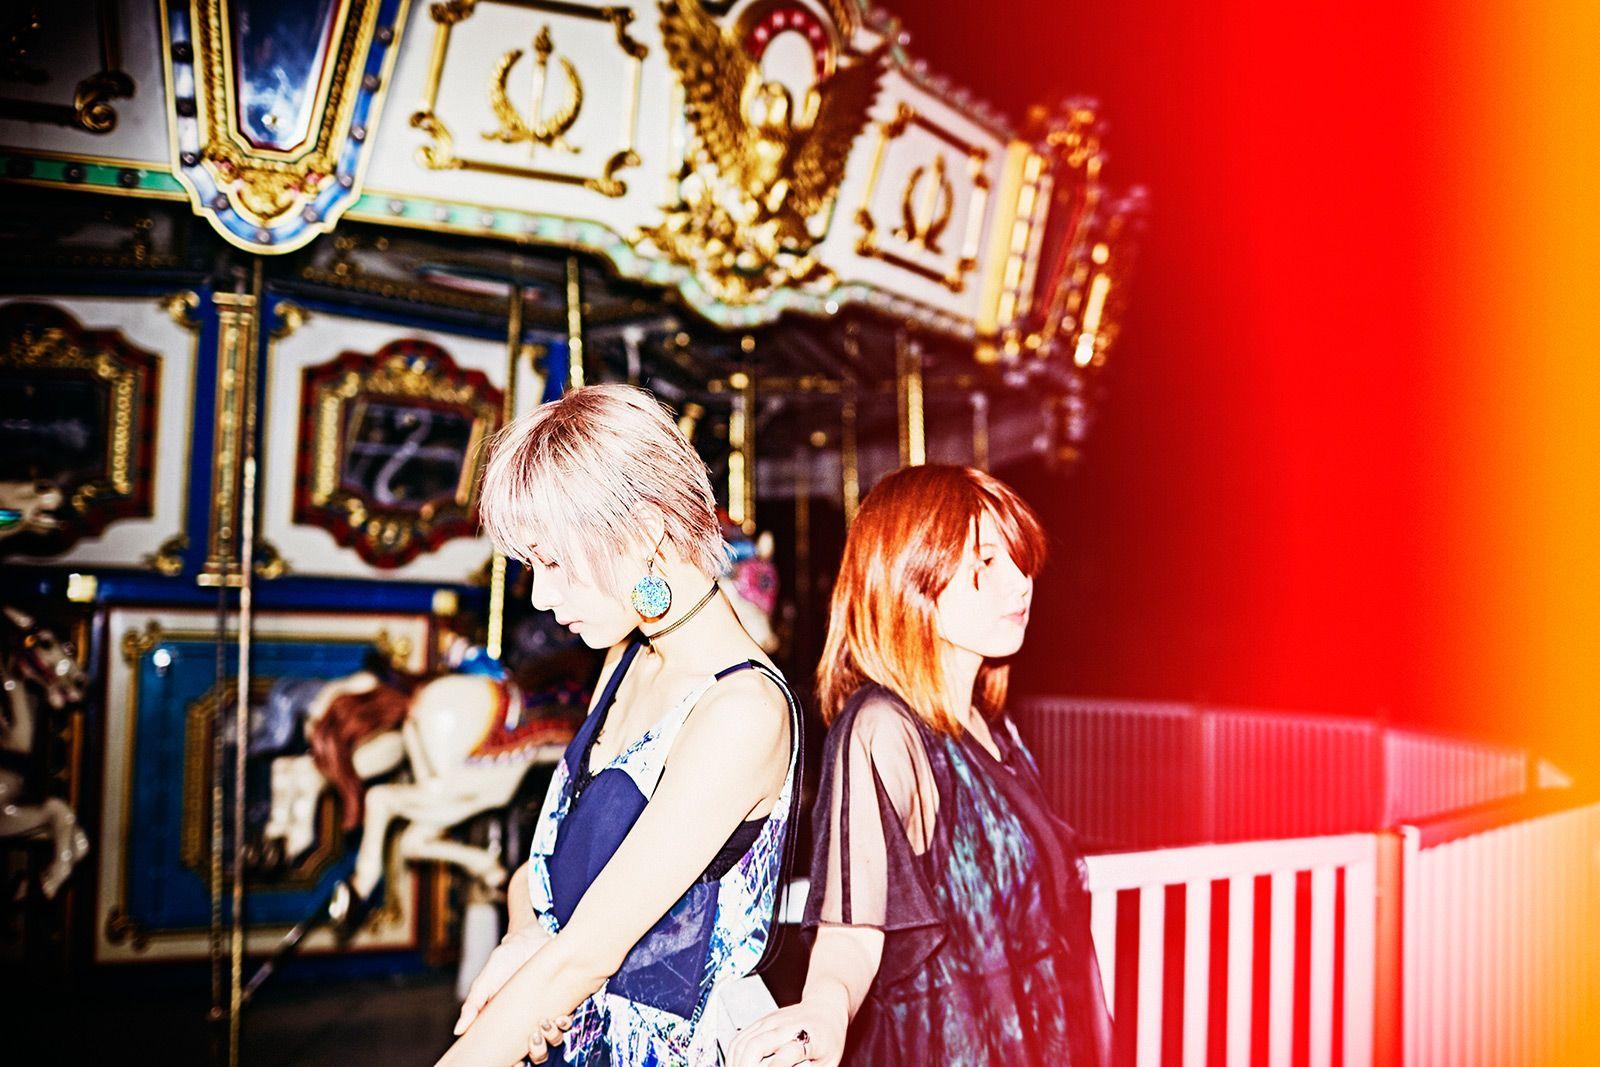 Haruka_to_Miyuki_Loveless-Artless_promo_new